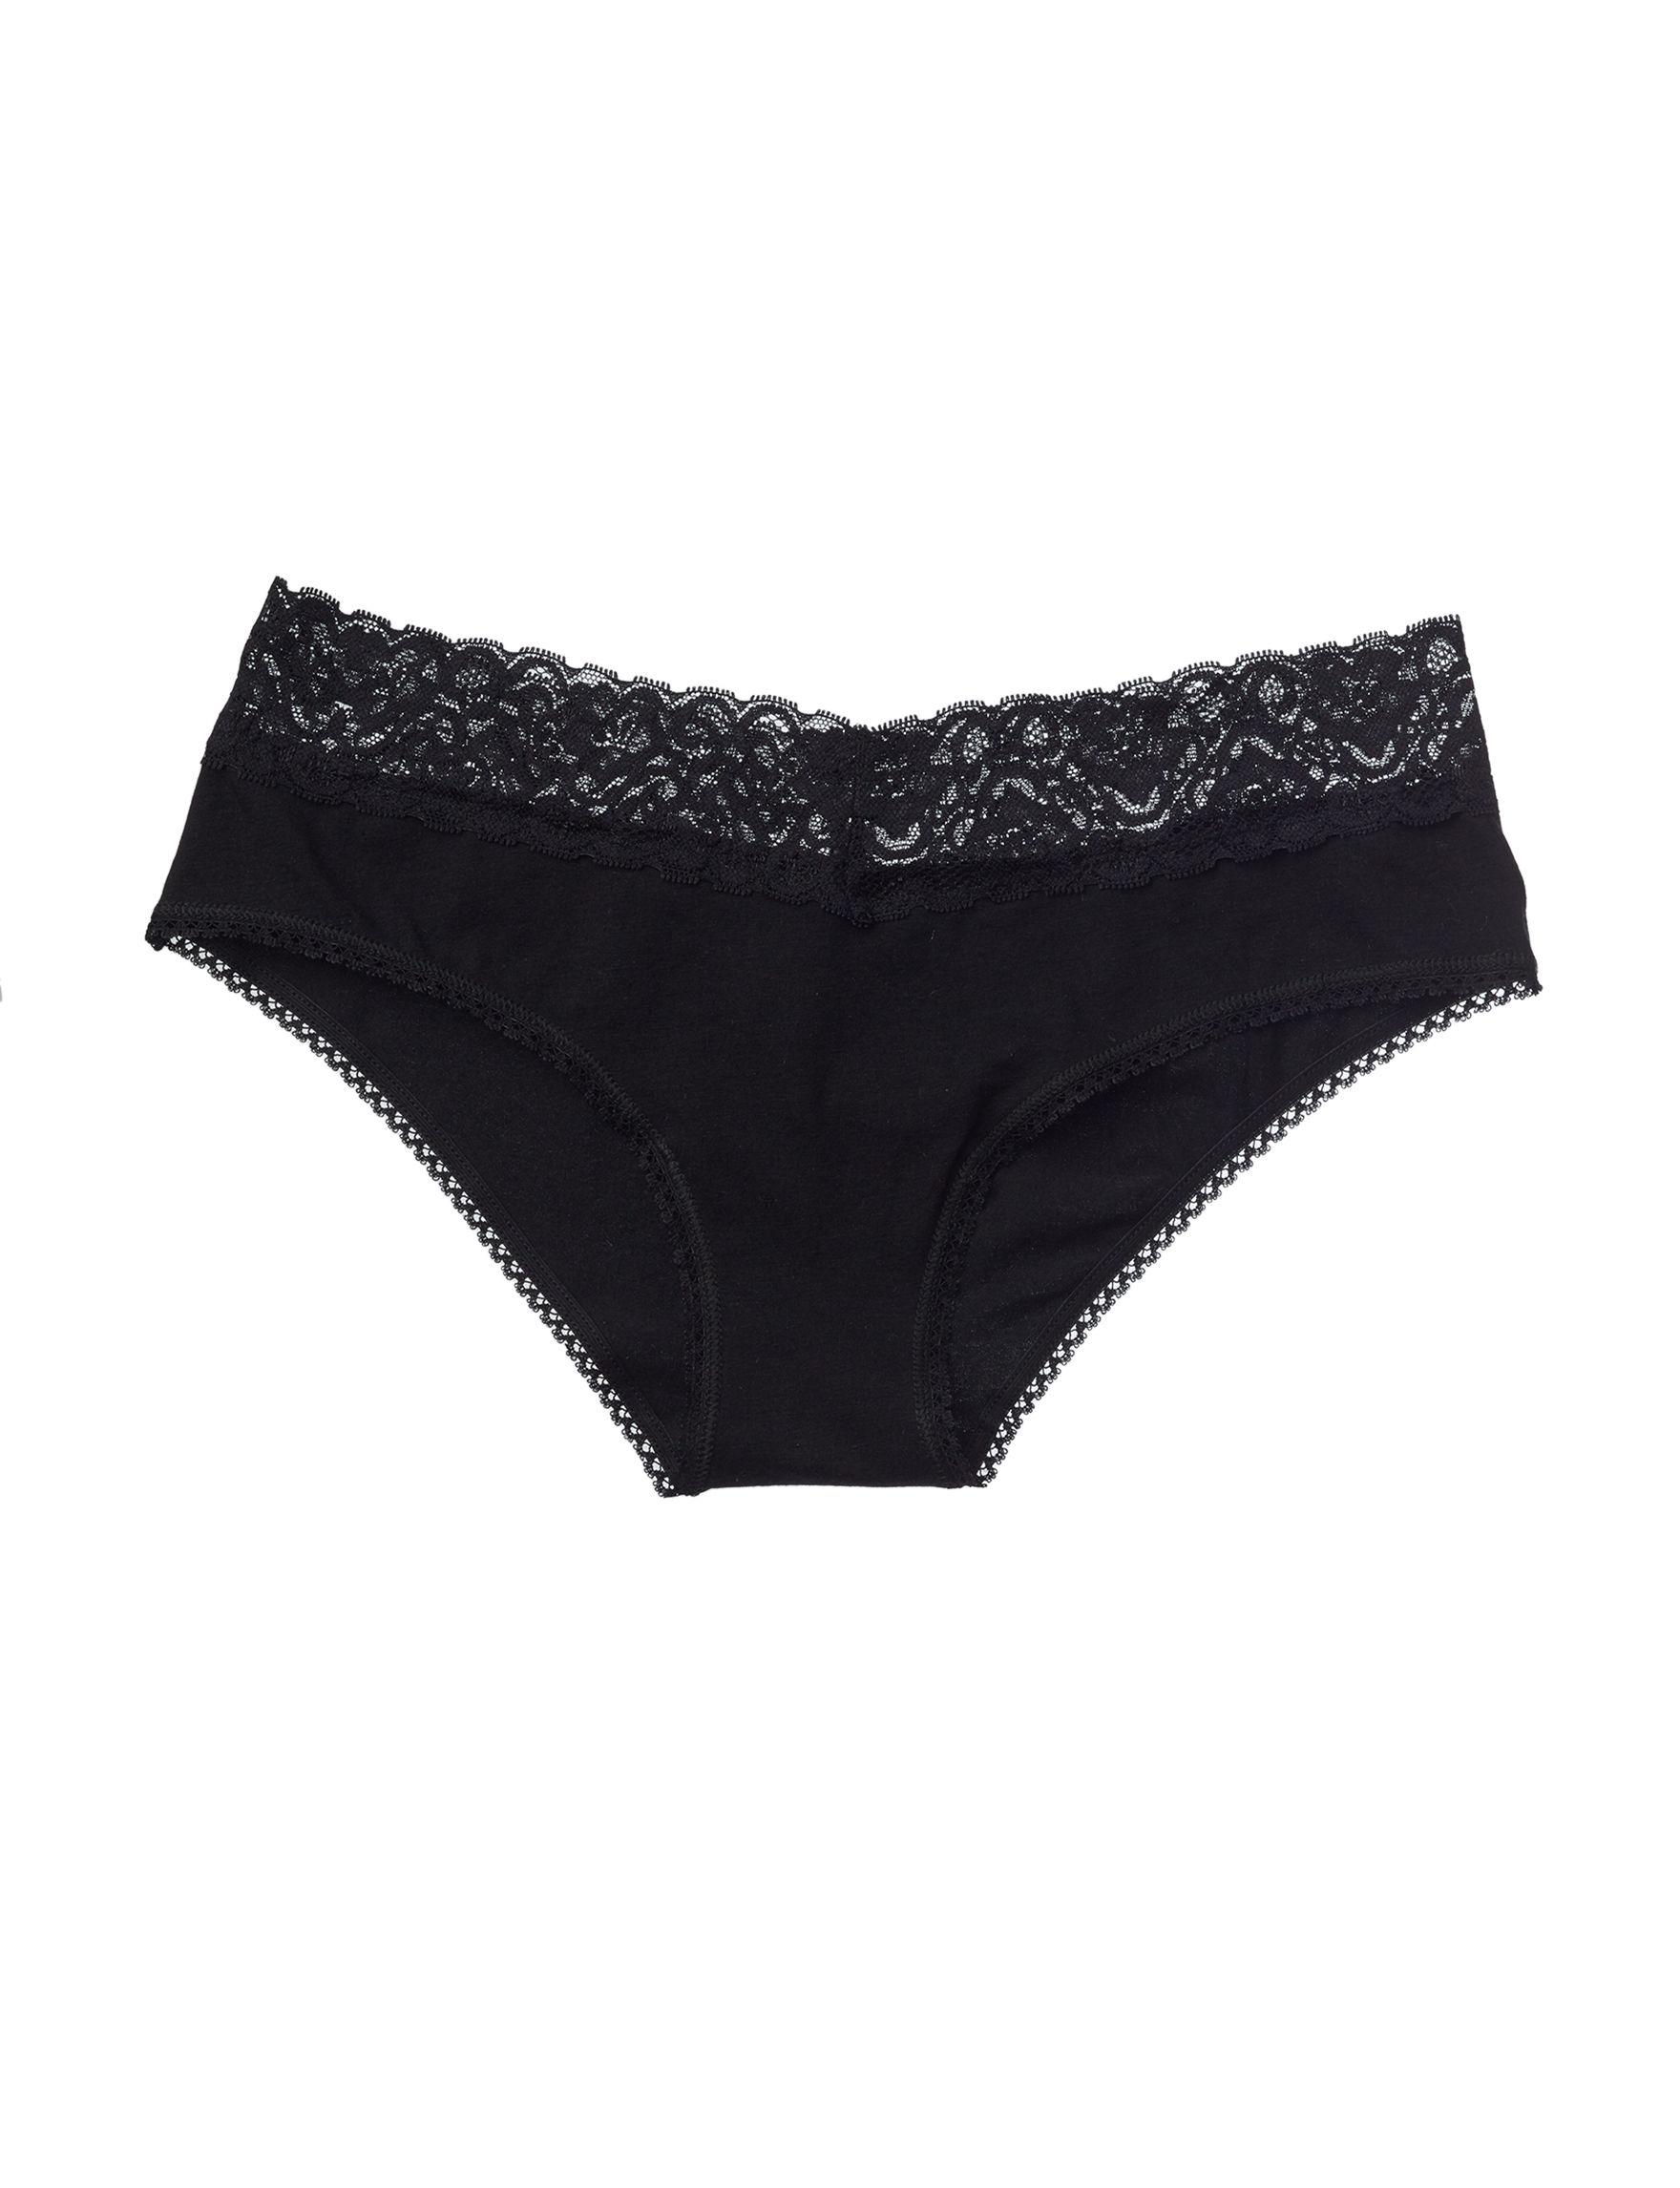 International Intimates Black Panties Hipster